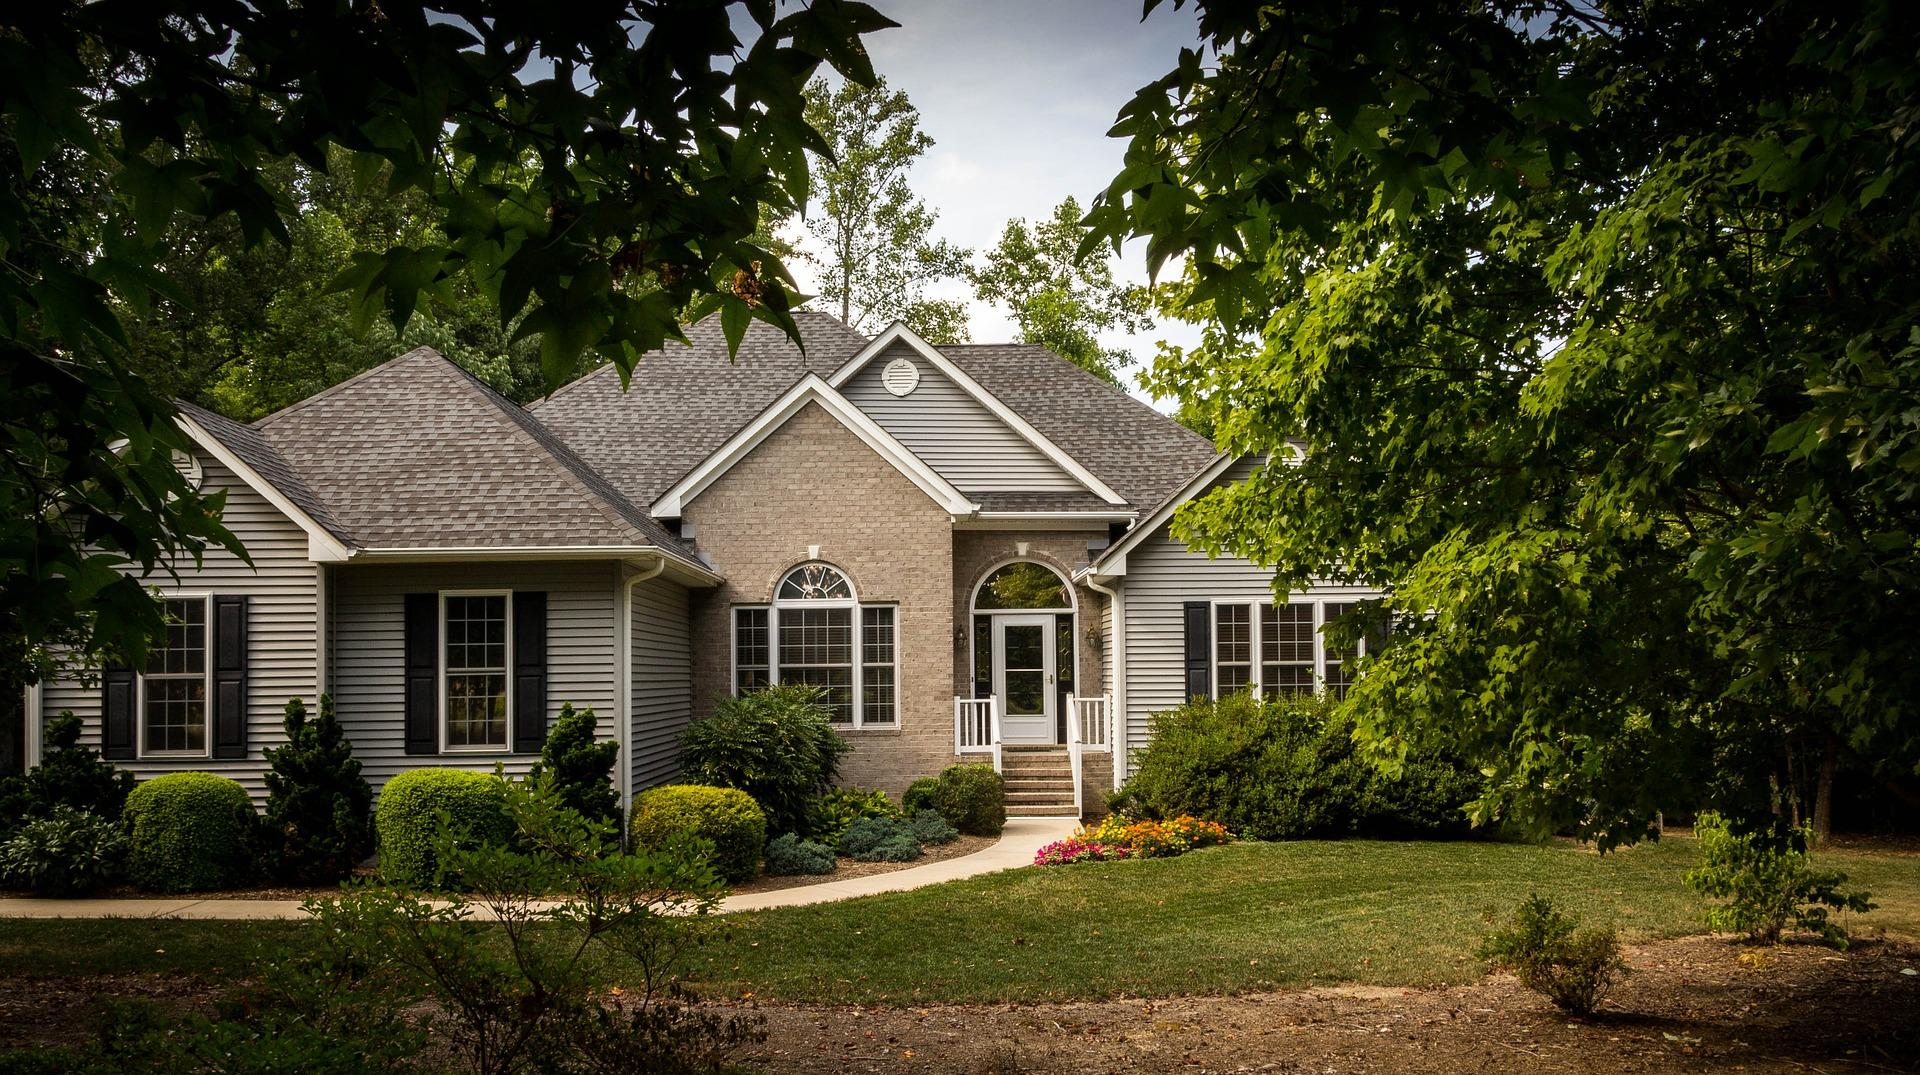 Where Can I Buy Coach House Insurance?